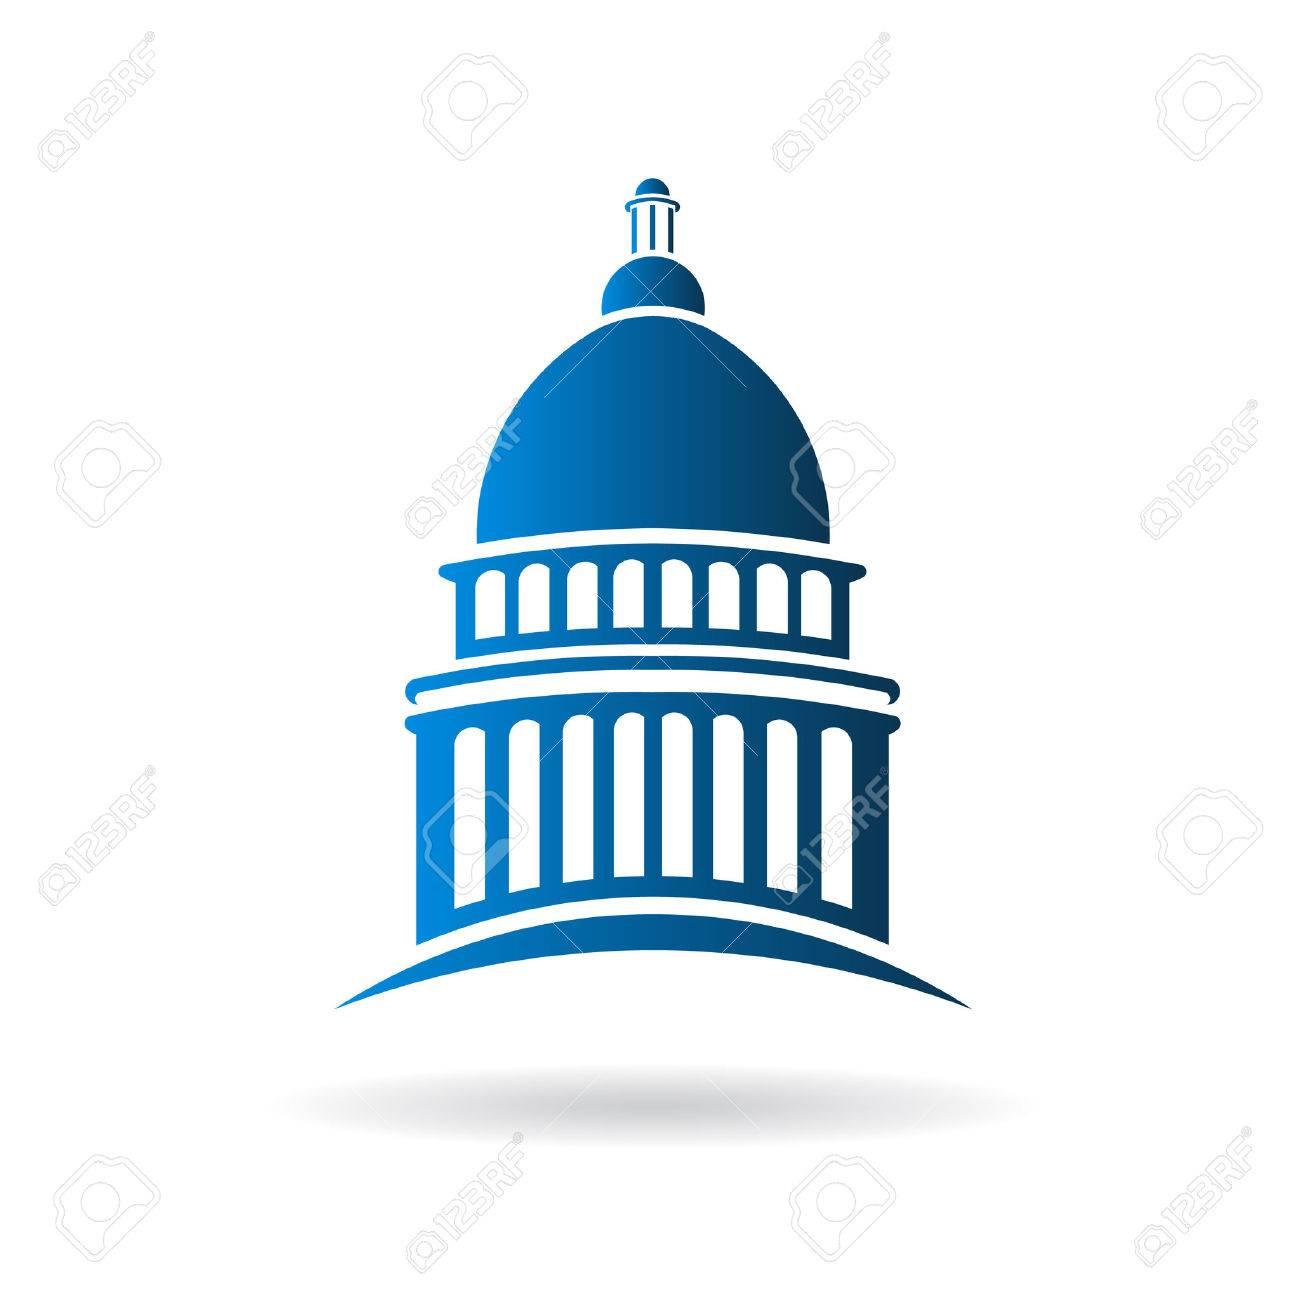 vector capitol building icon royalty free cliparts vectors and rh 123rf com capitol records building vector capitol building vector free